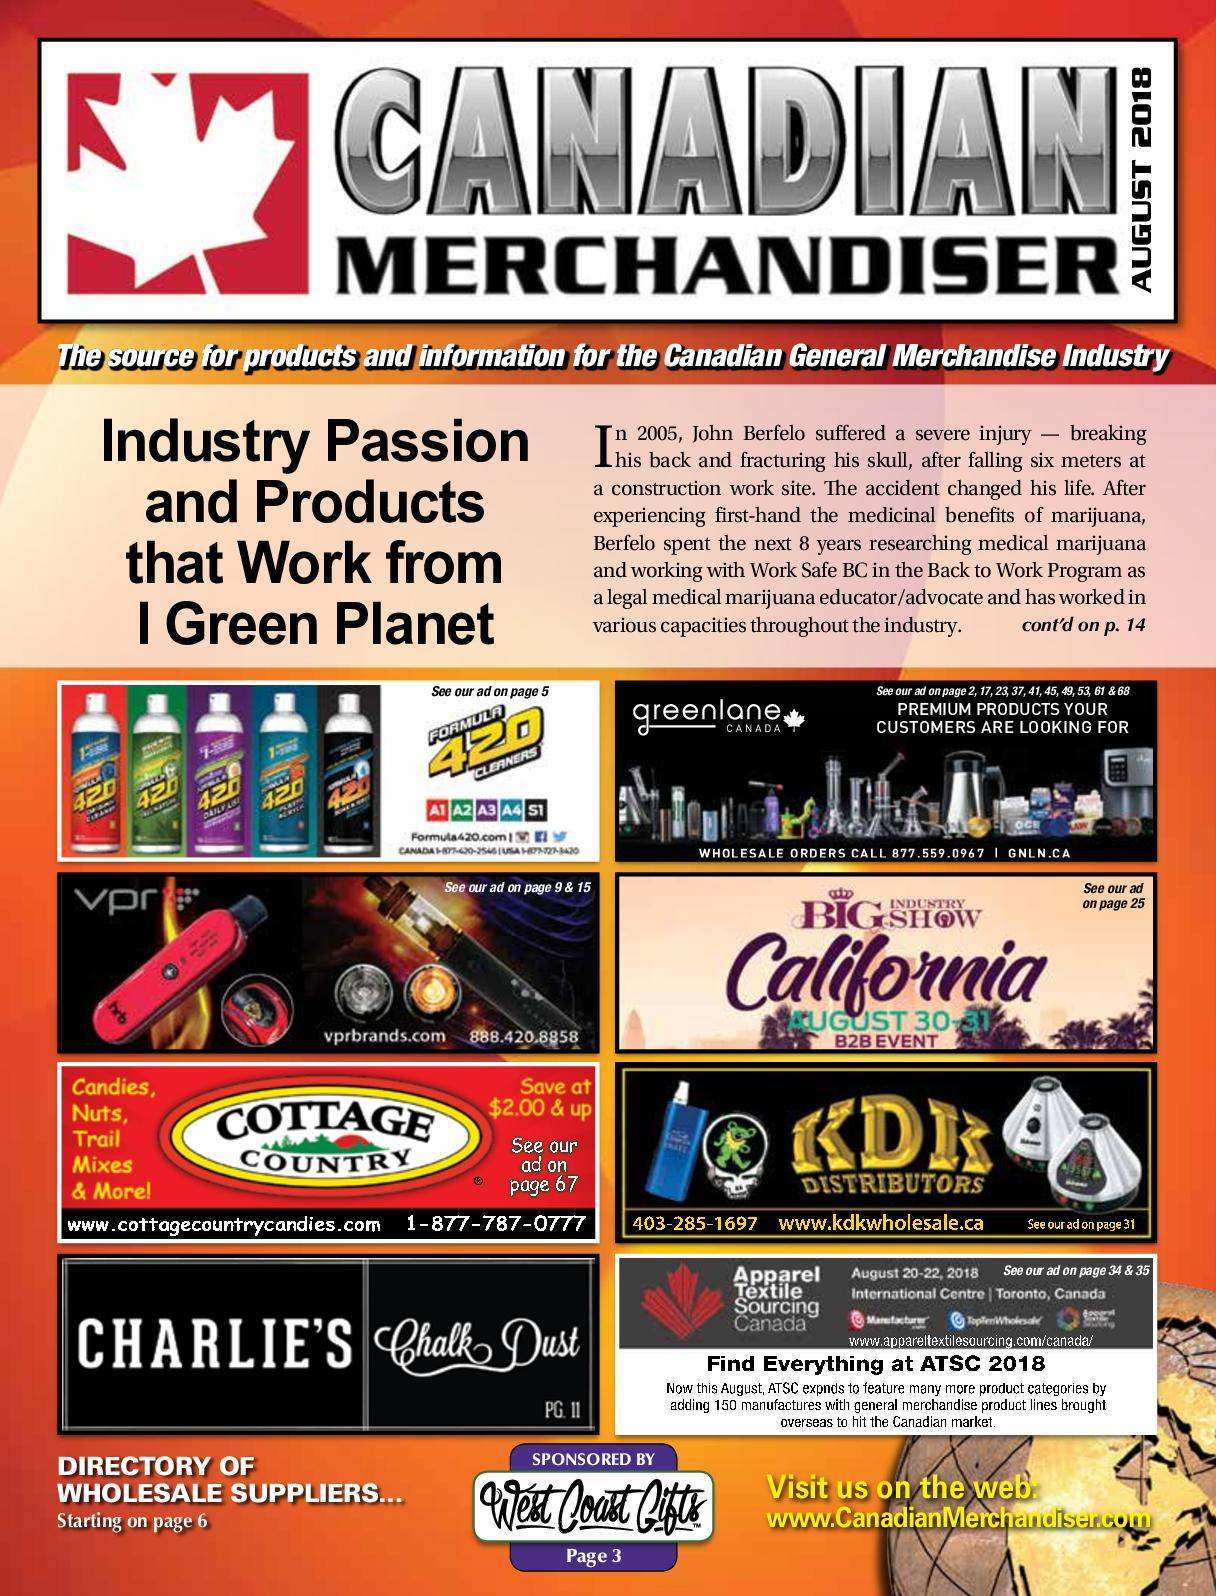 Calaméo - Canadian Merchandiser Aug2018 7199a72977e9